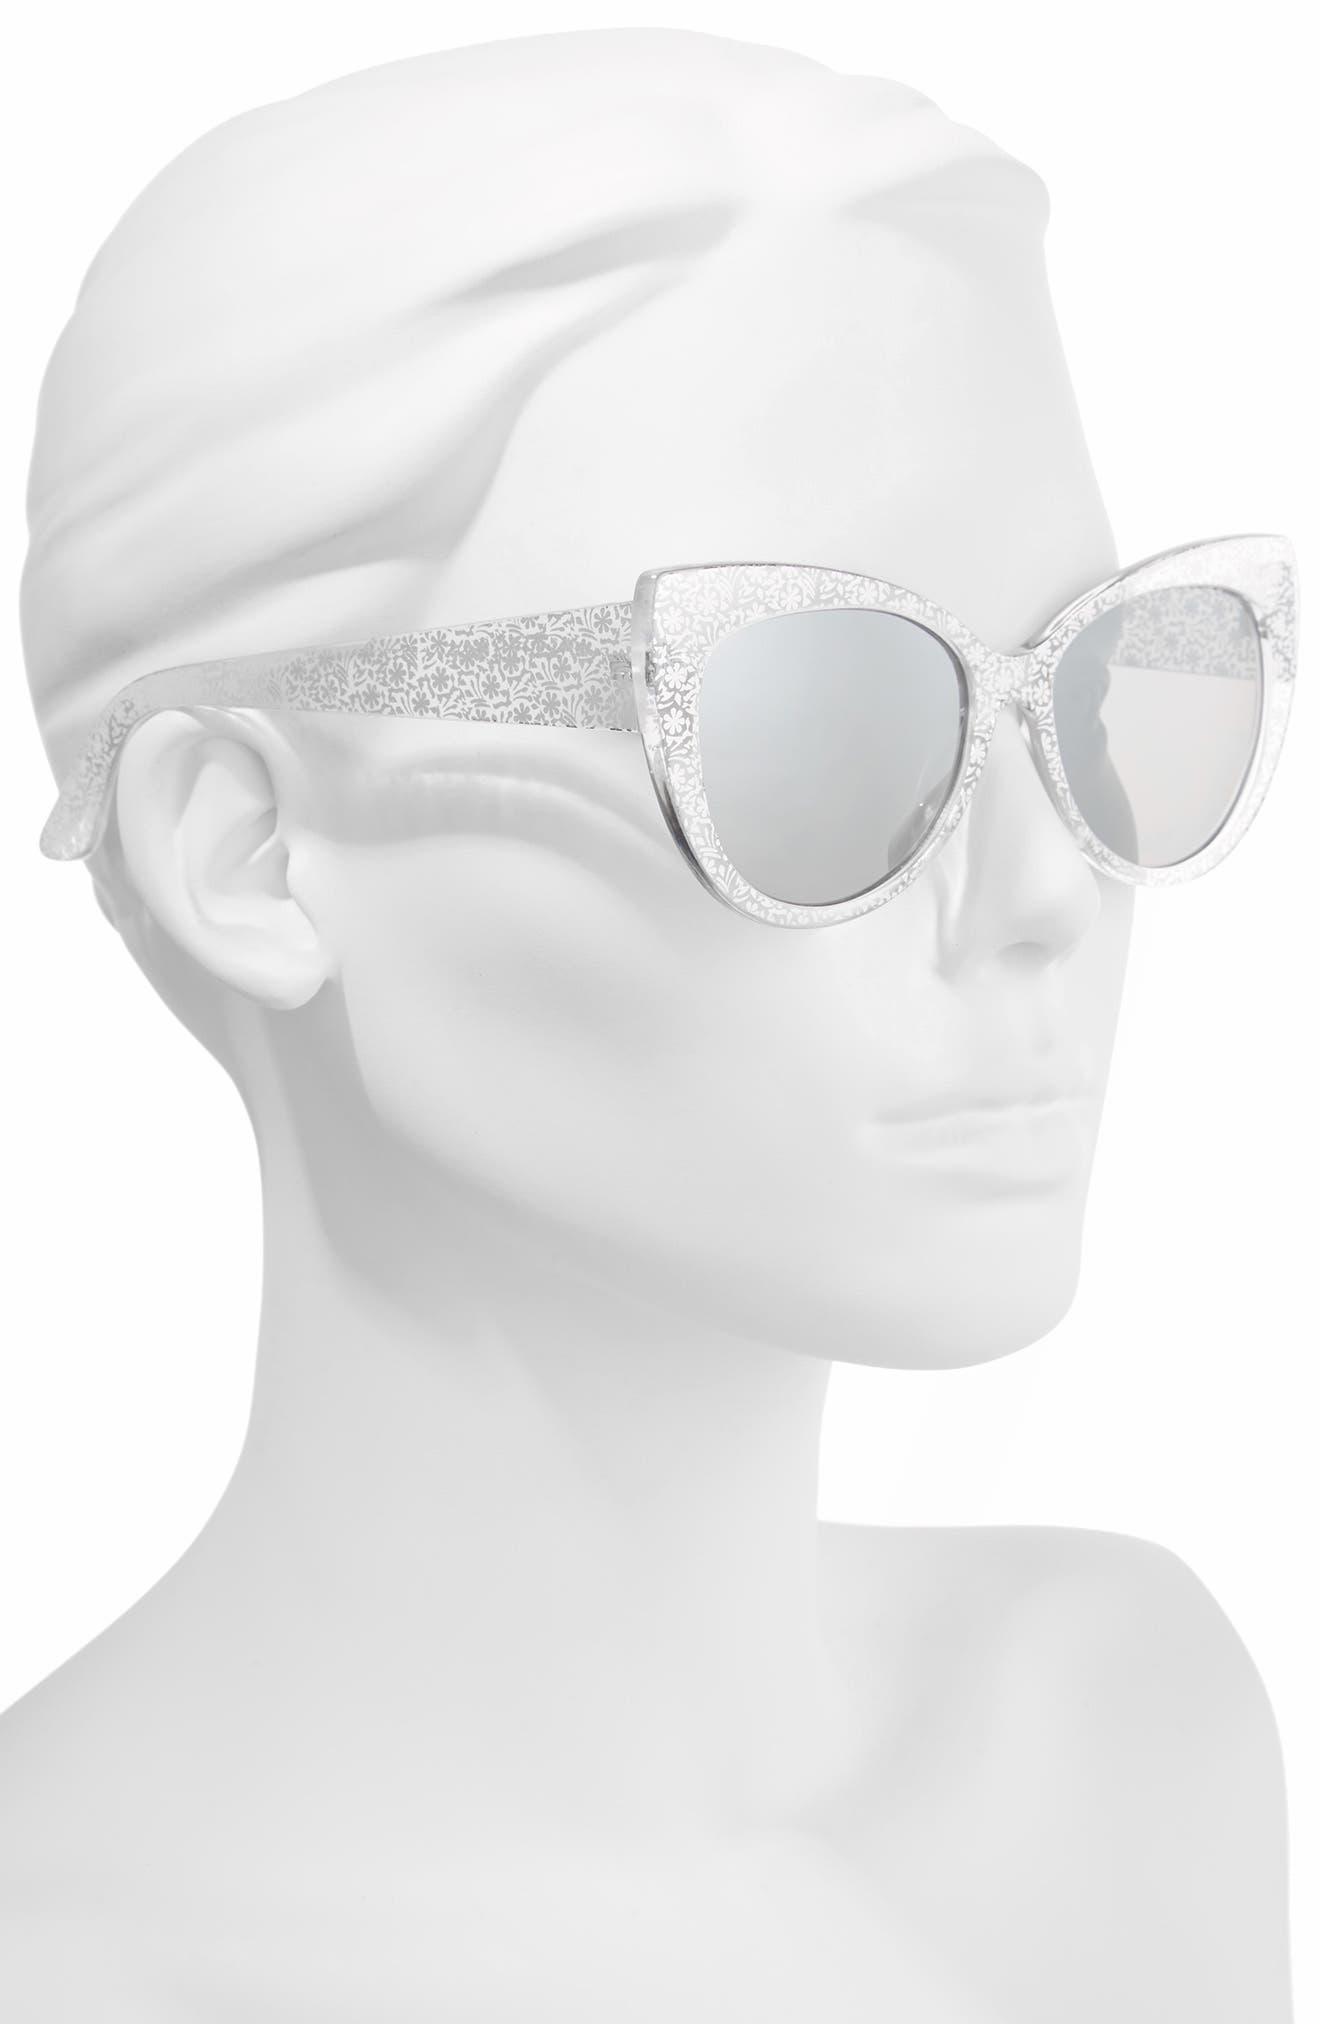 55mm Floral Cat Eye Sunglasses,                             Alternate thumbnail 3, color,